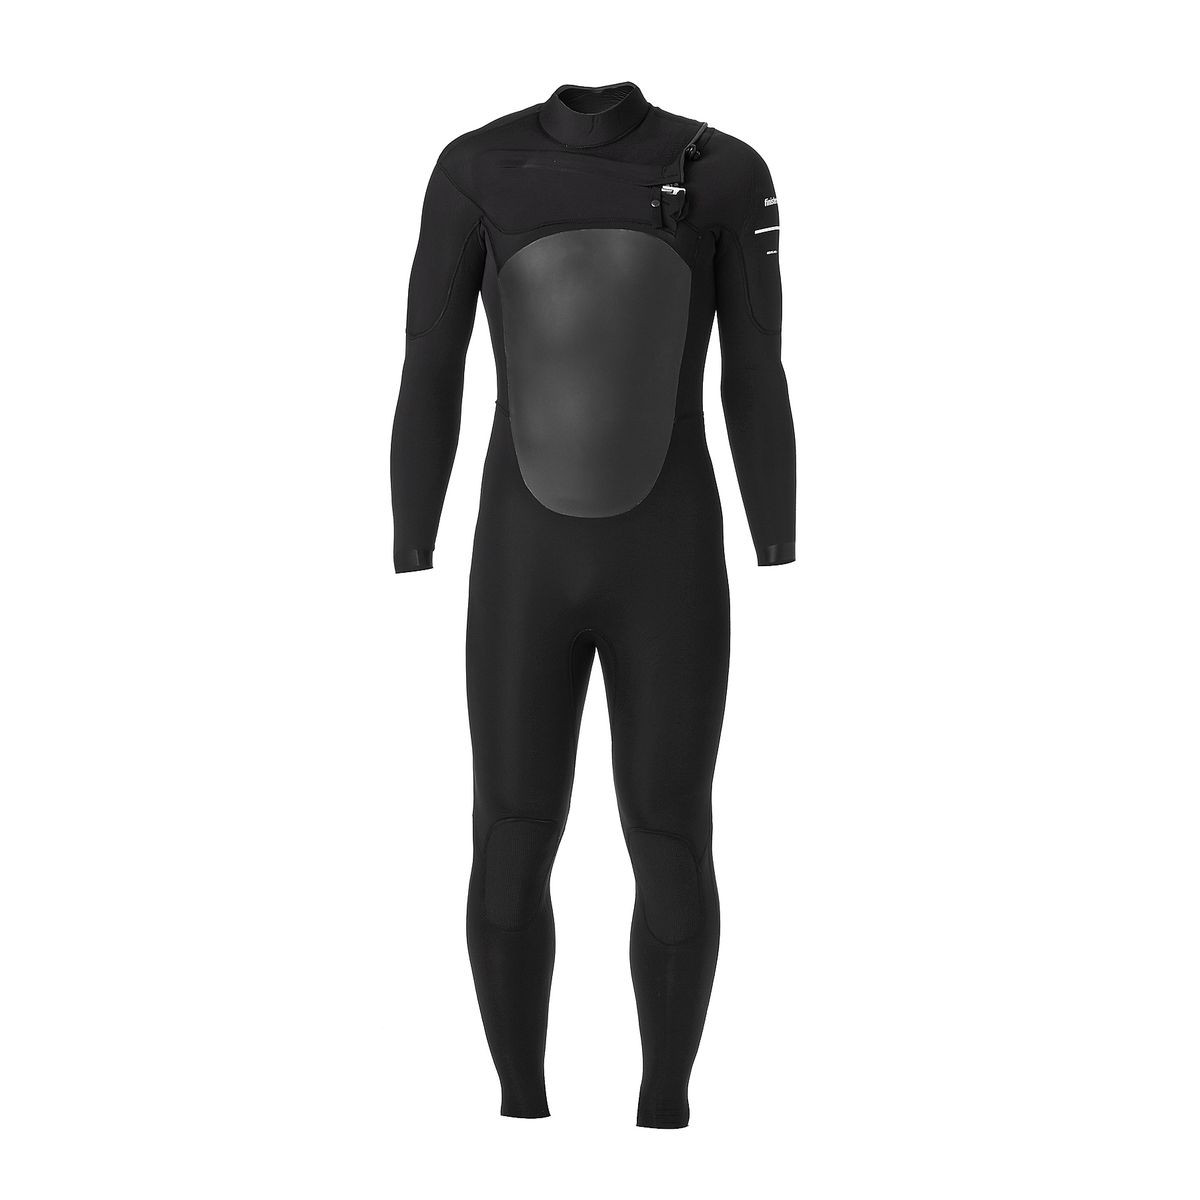 Finisterre Nieuwland 4/3mm Chest Zip Wetsuit - Black